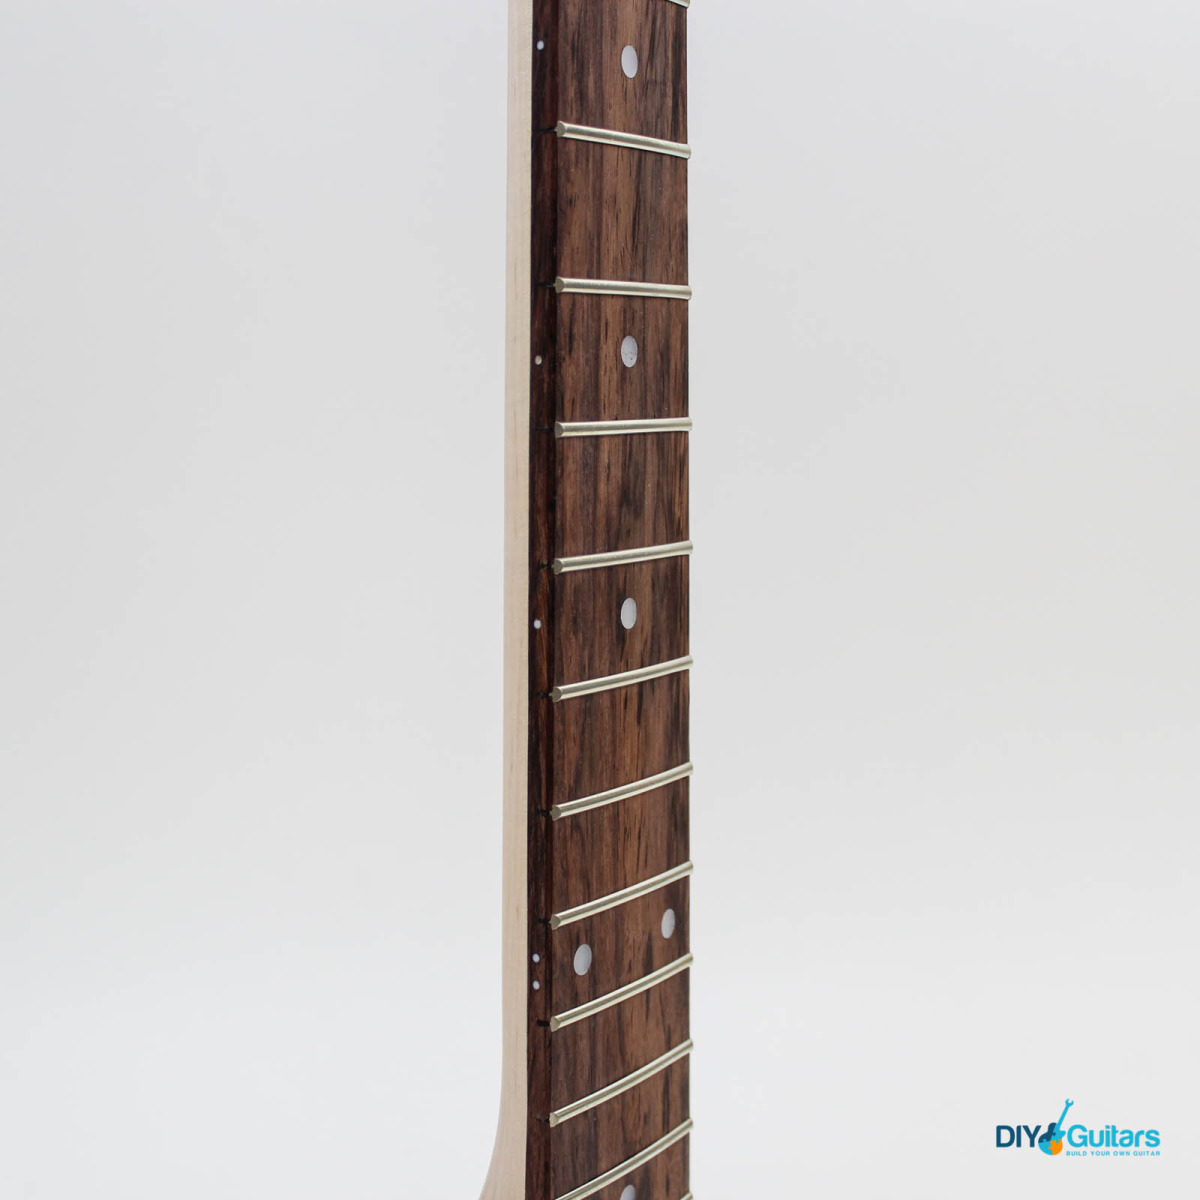 Fender Stratocaster Style Guitar Kit Diy Guitars Builder Understanding The 5way Switch Strt 14 Variations